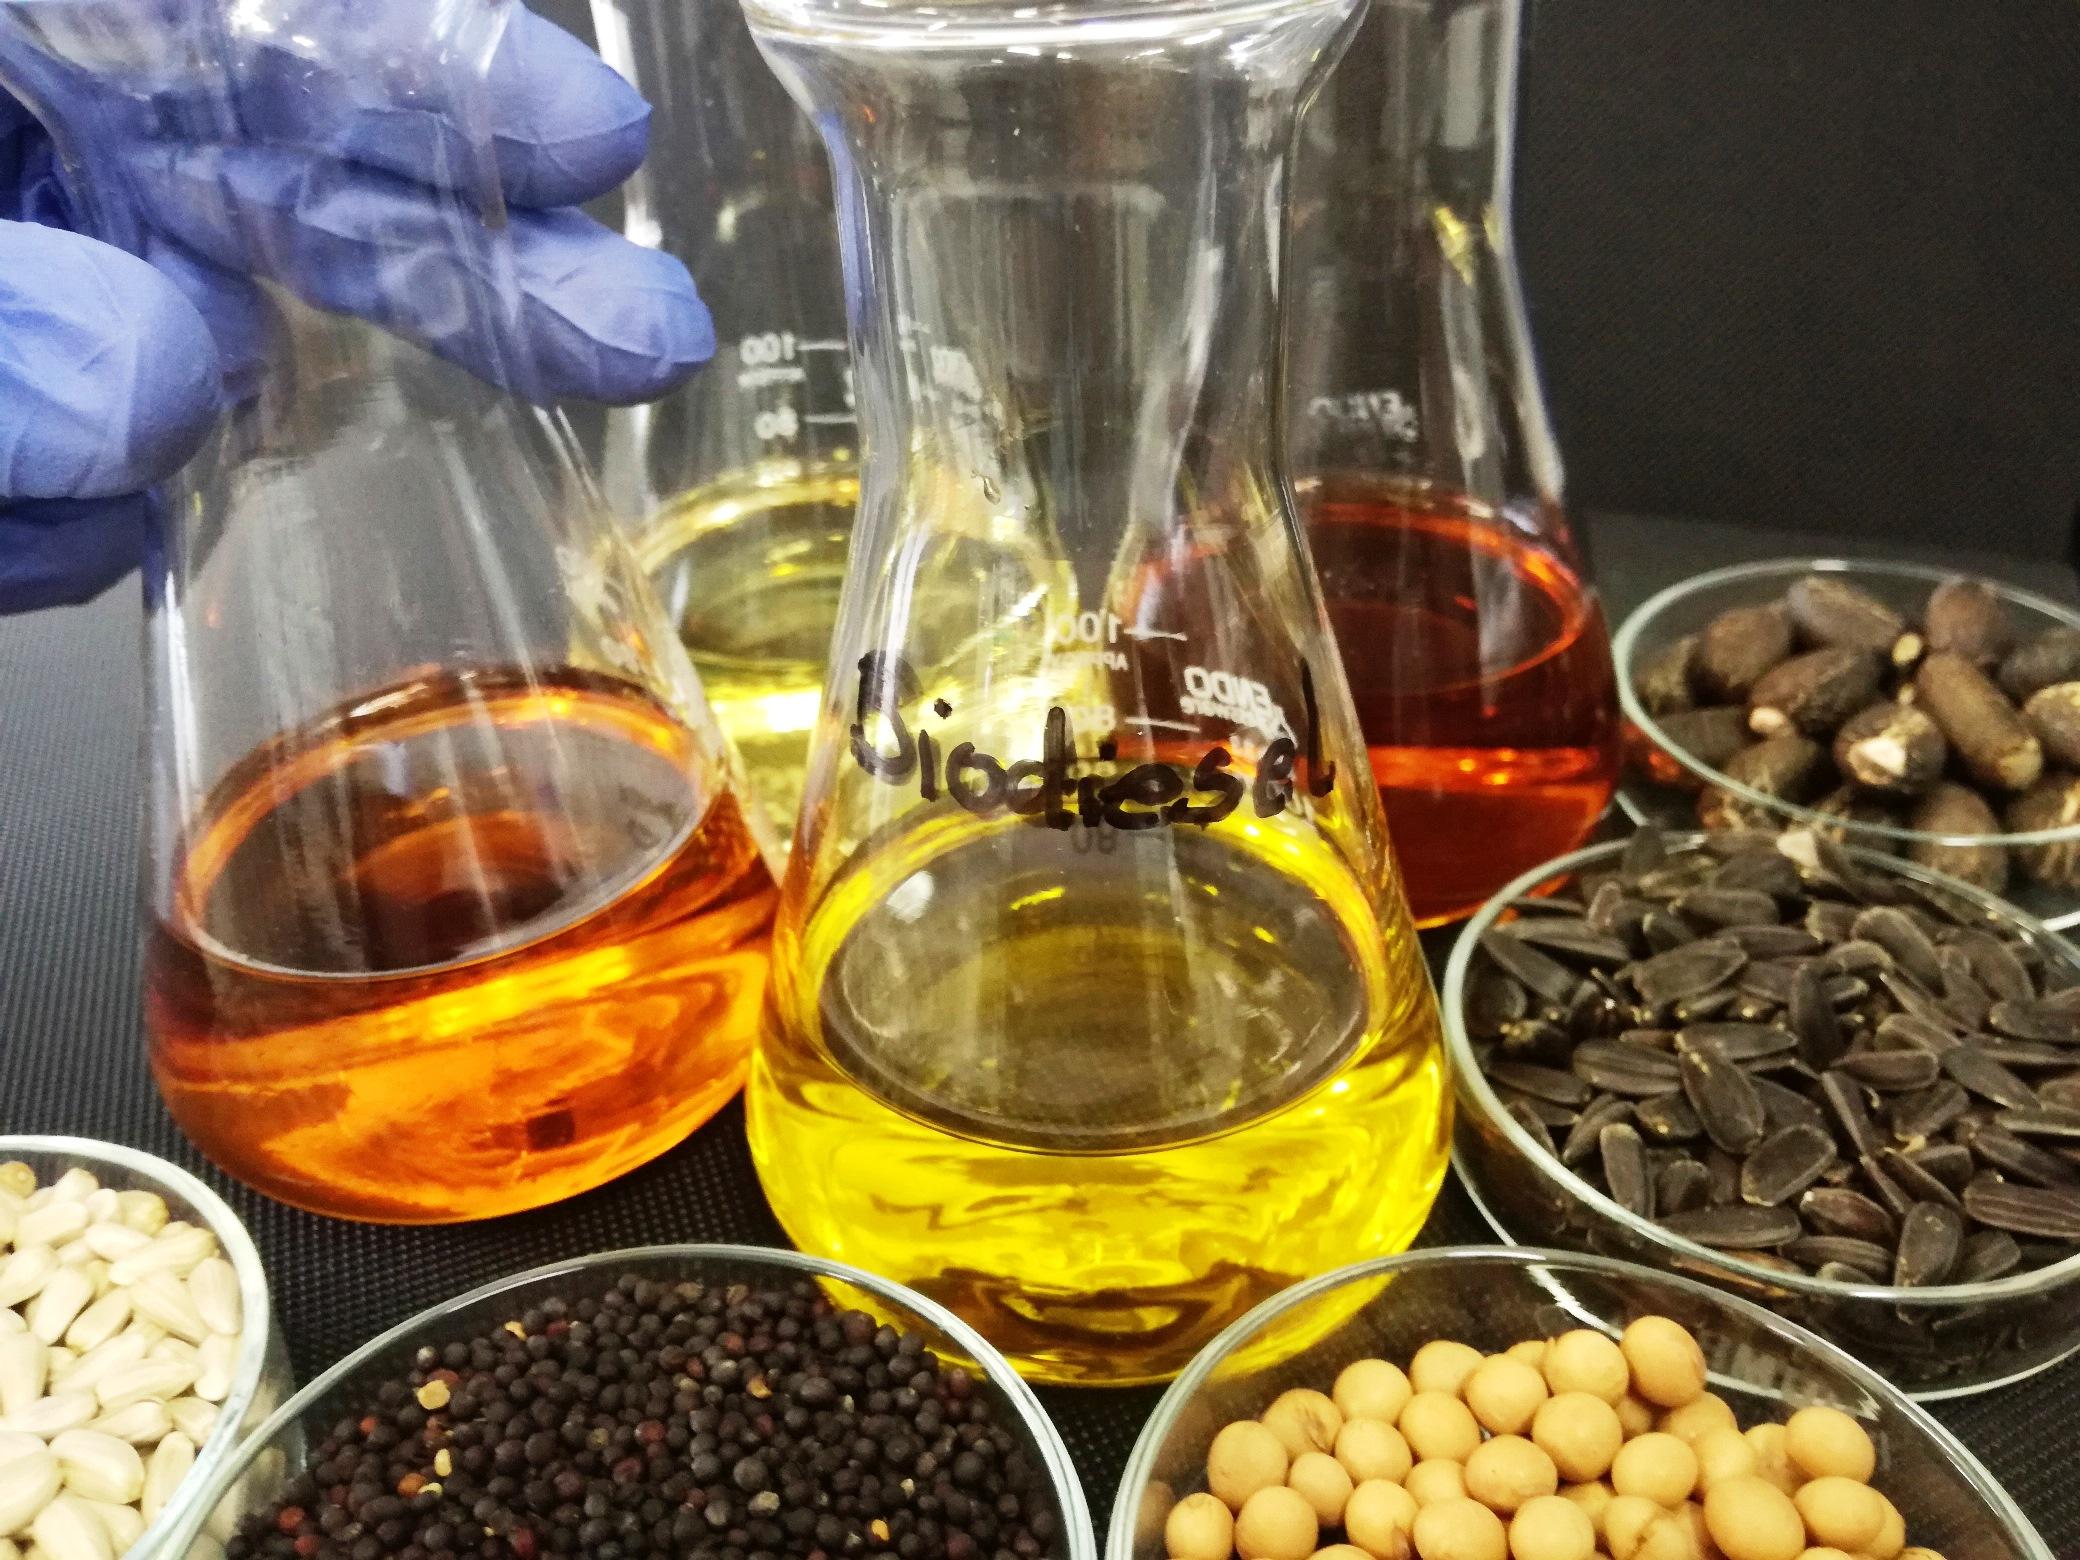 Biodiesel - Derivados de óleos e gorduras-Ésteres metílicos de ácidos gordos (FAME)